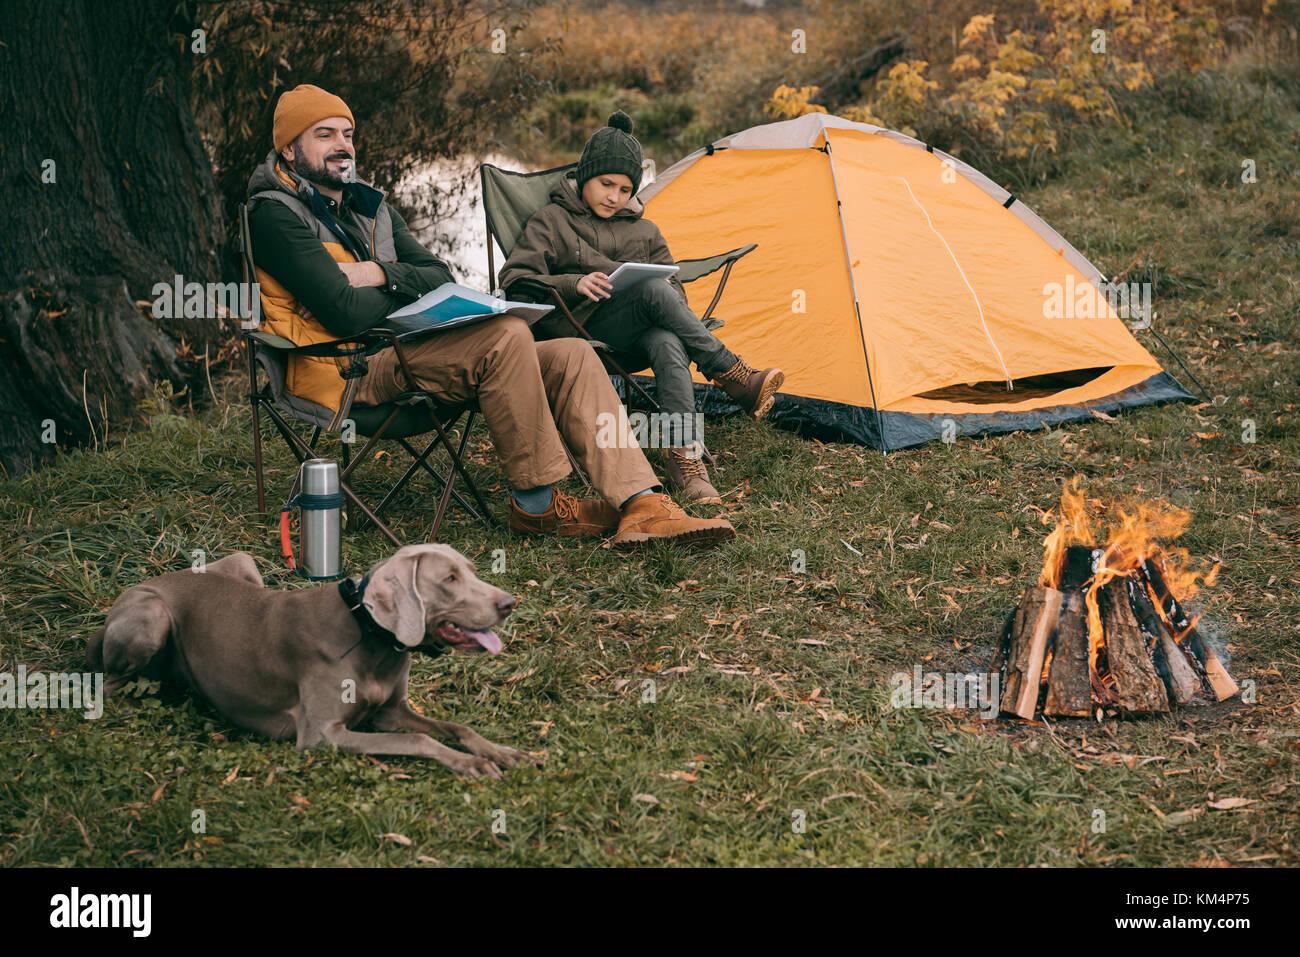 travelers - Stock Image